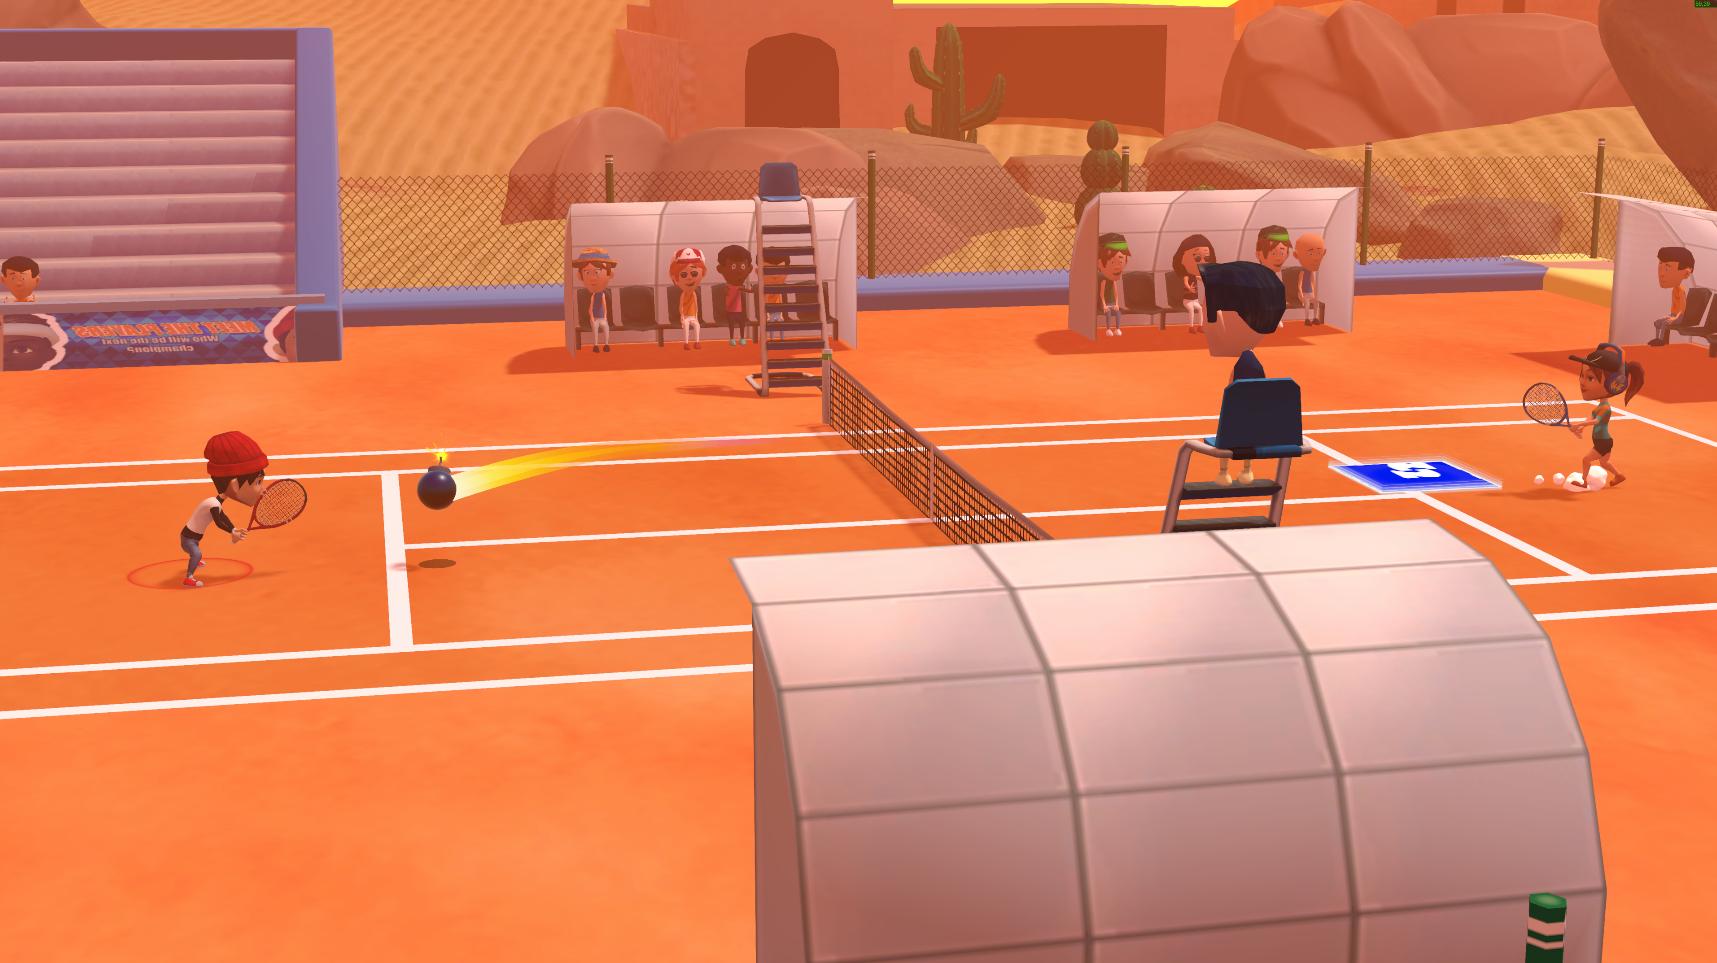 instant sports tennis screenshot (4)